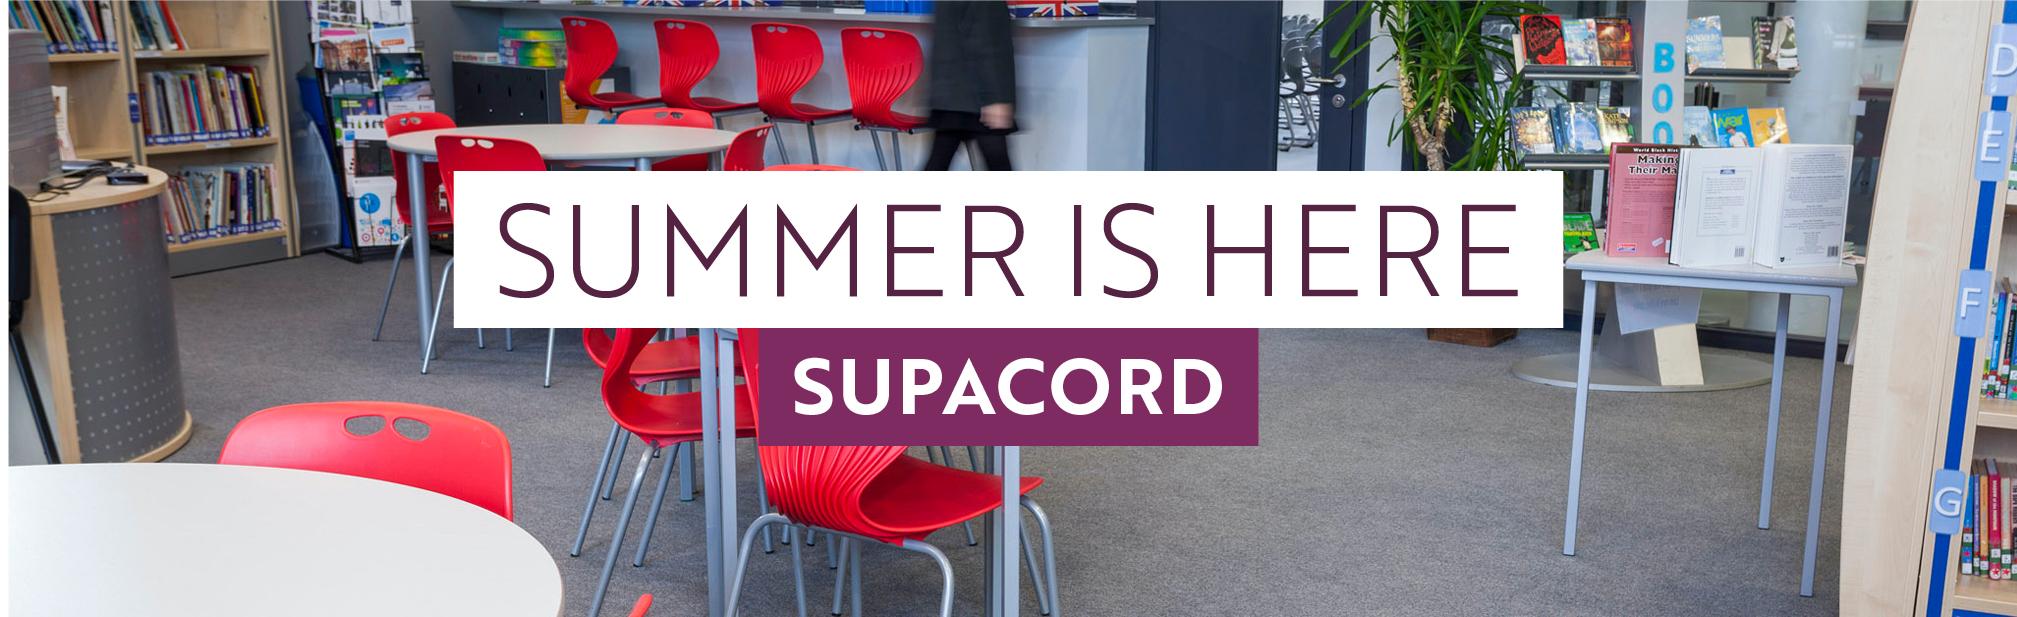 Heckmondwike   Supacord   Commercial Carpets   Fibre Bonded Carpets   Education